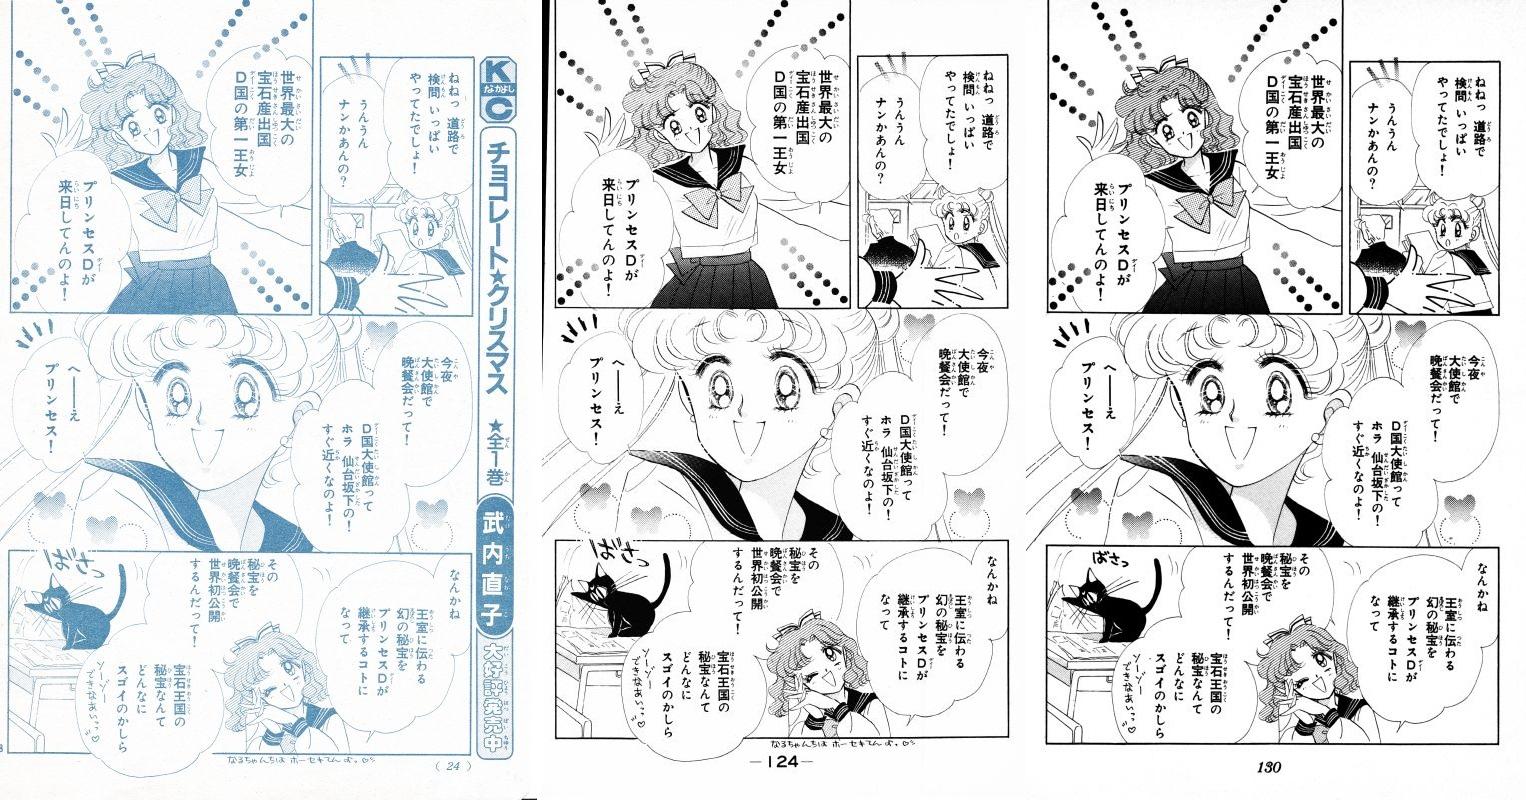 Act 4, Page 5 – Nakayoshi, Original, Remaster